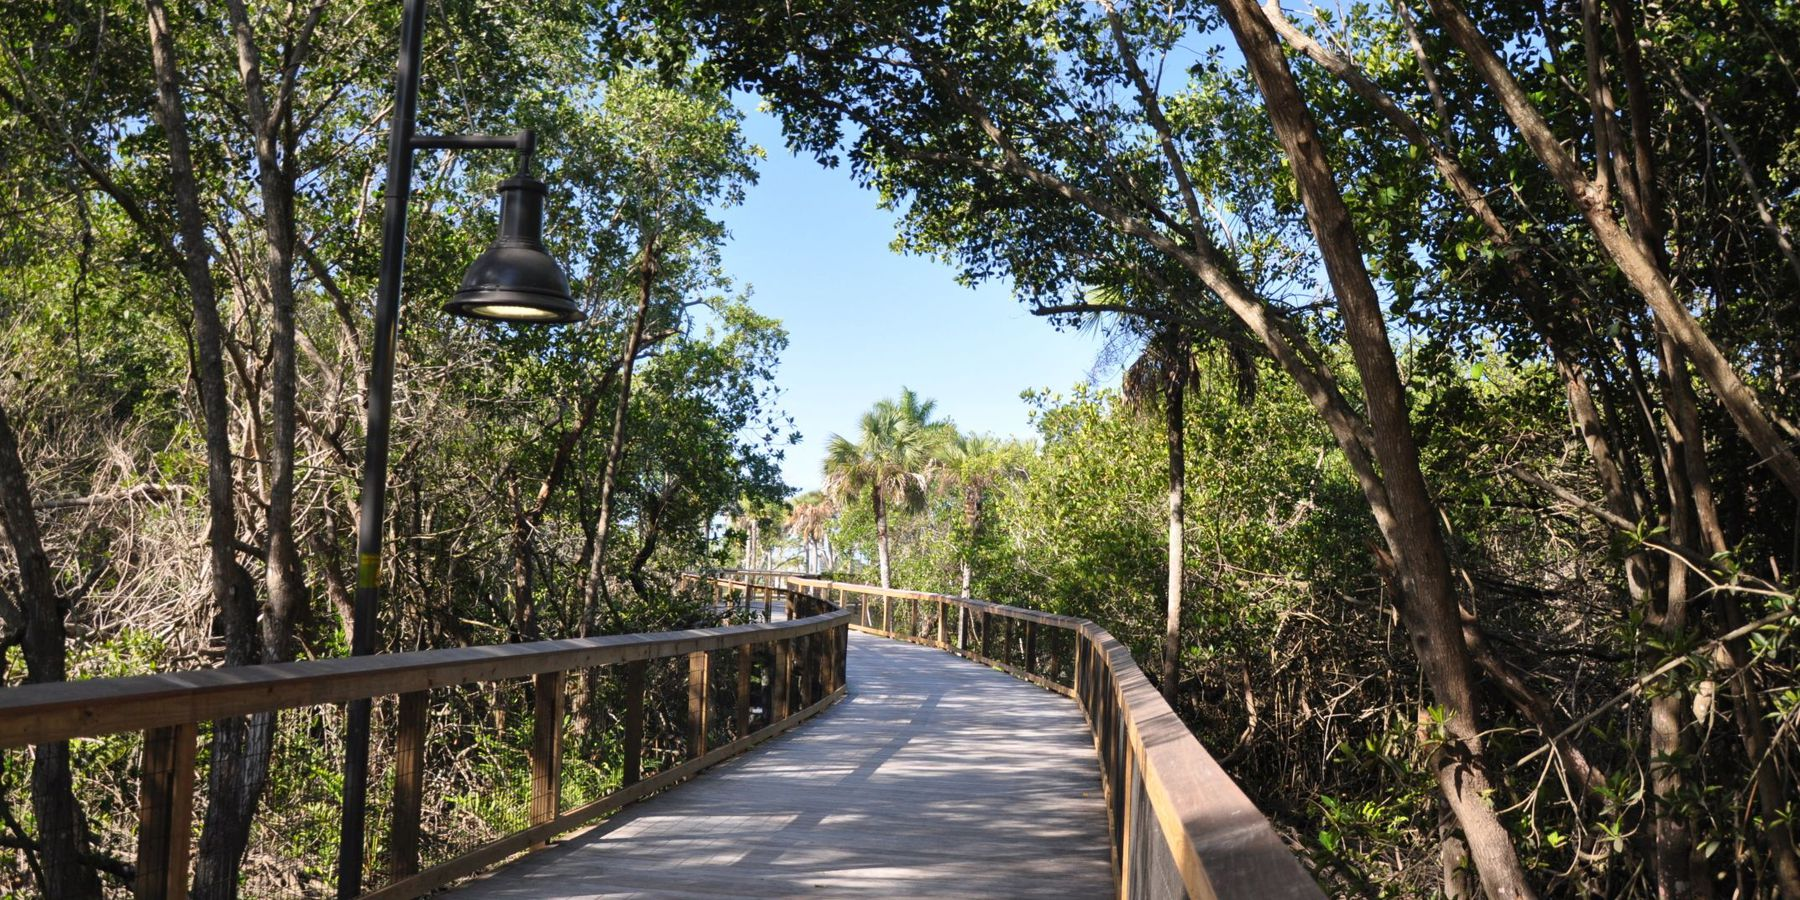 Boardwalk - Everglades National Park - Florida - Doets Reizen